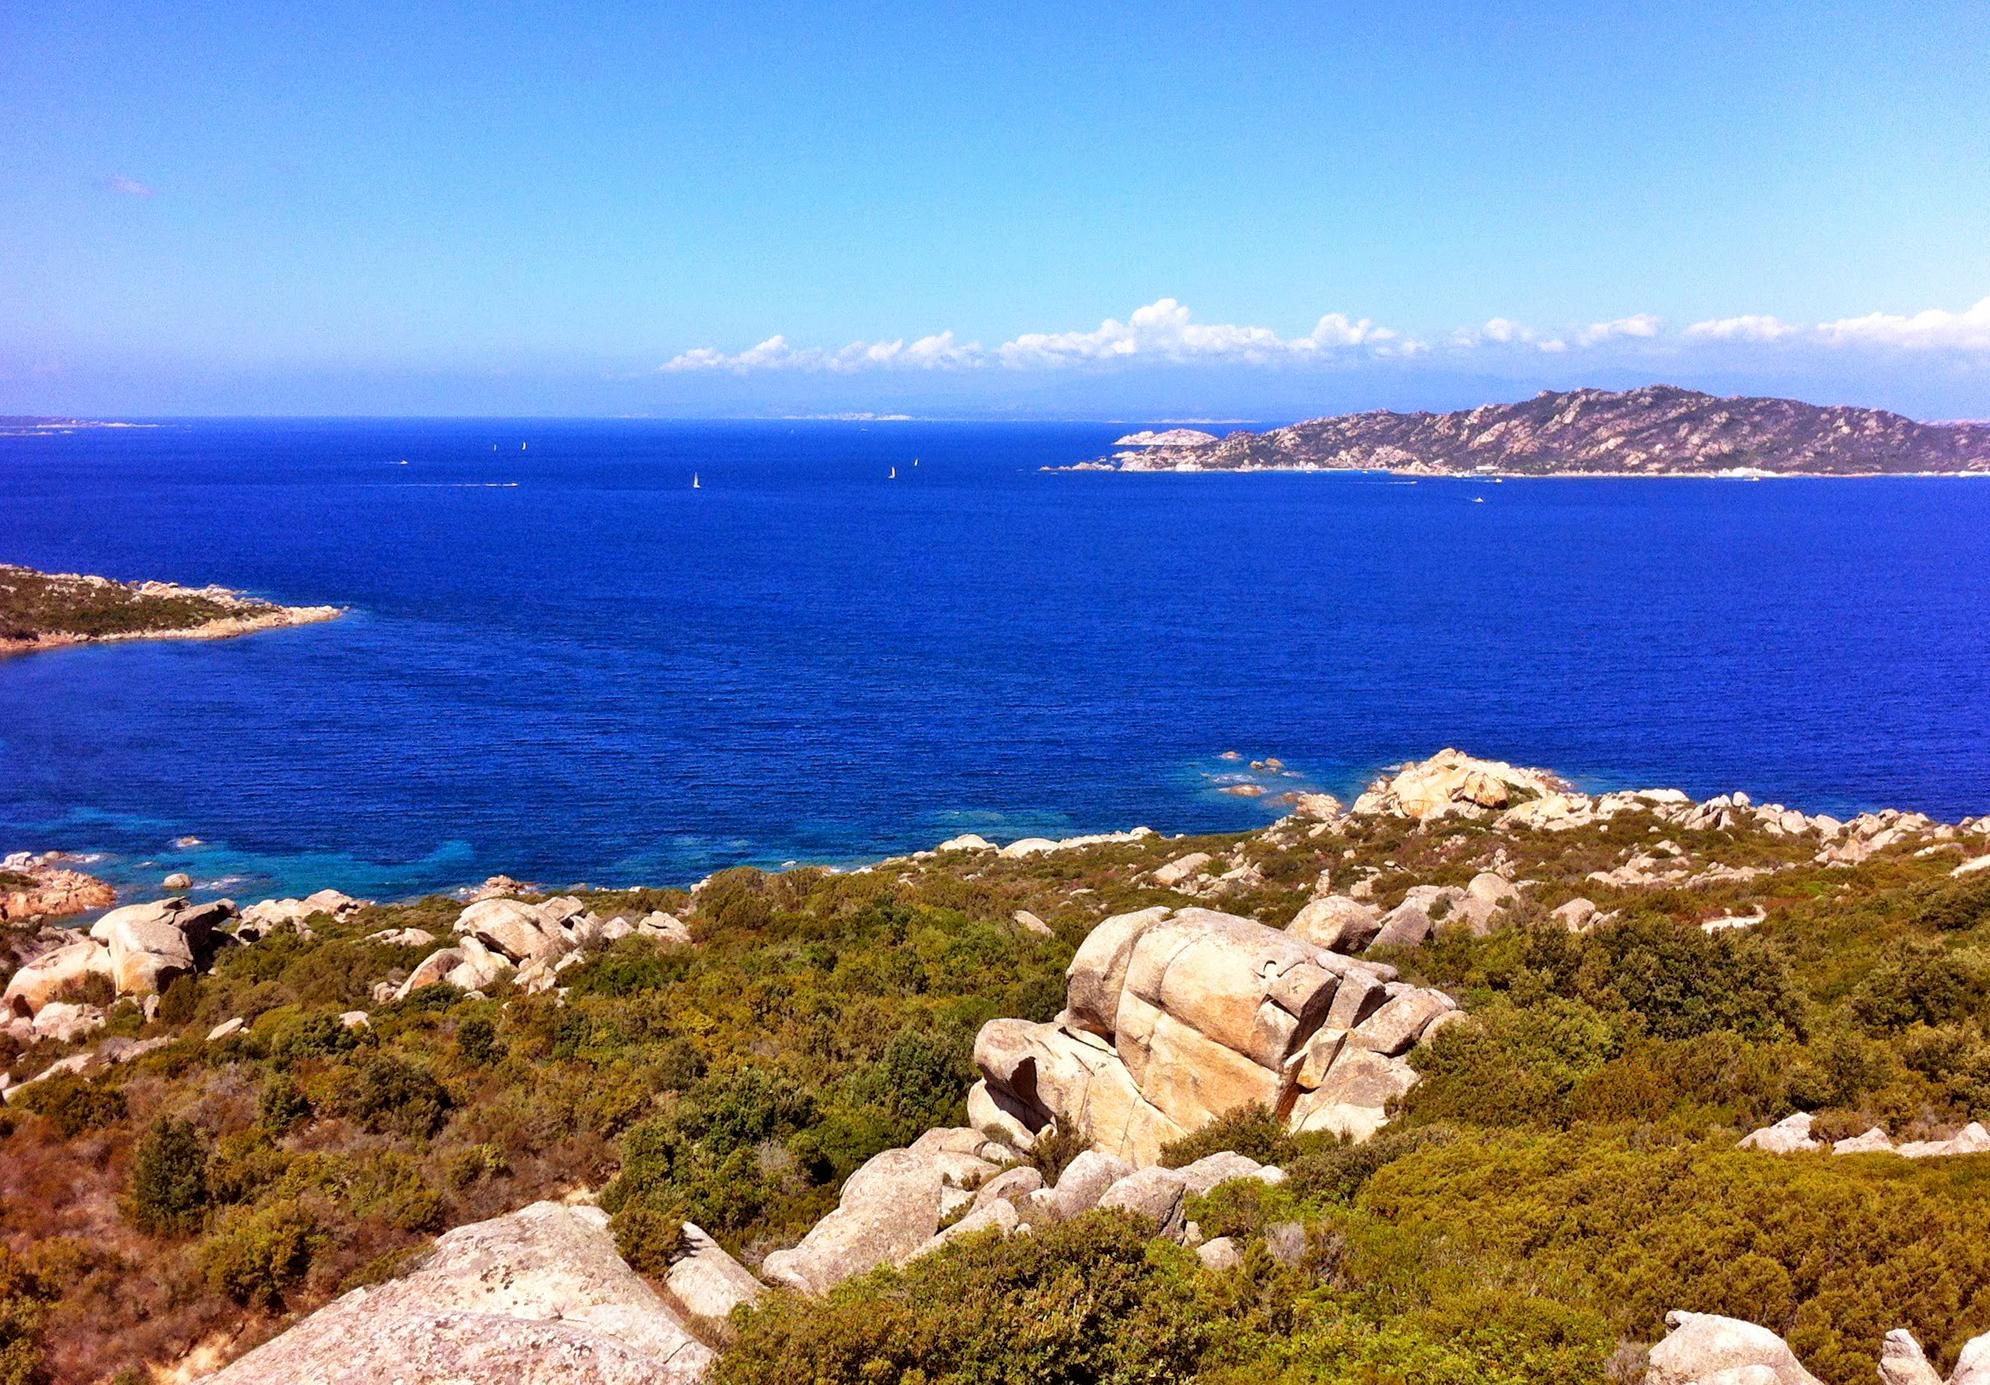 Sardinian coast in Spring